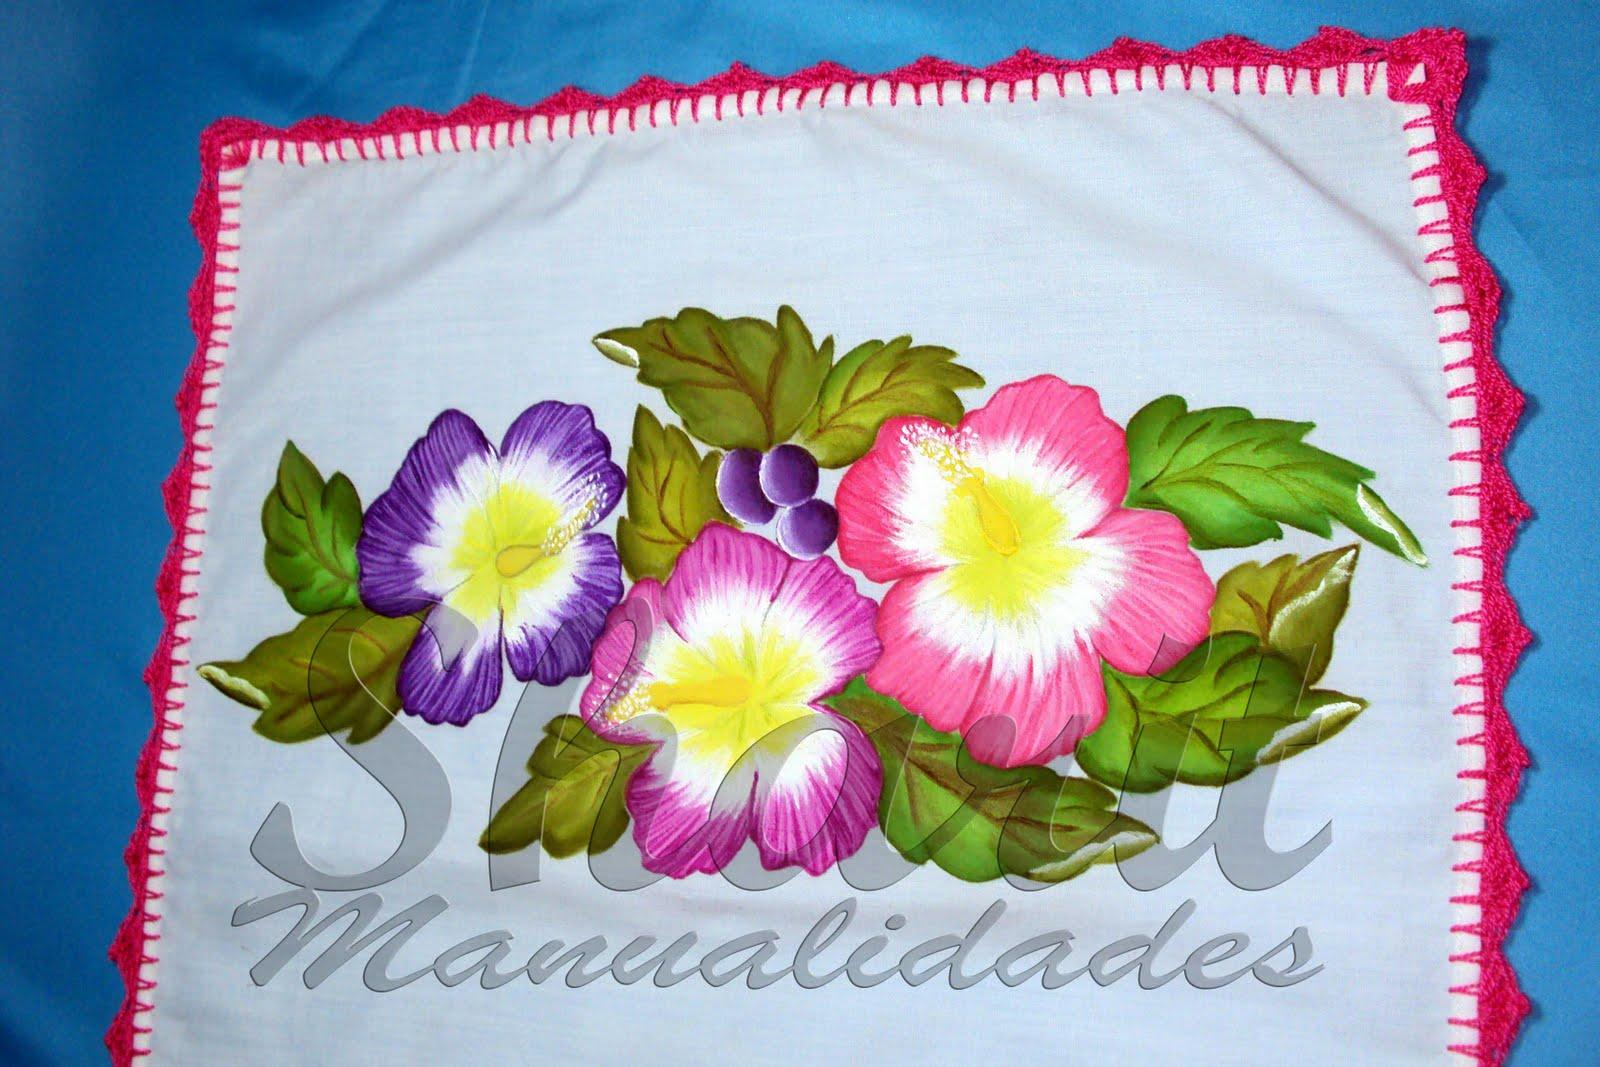 Camino de Mesa Pintado en Tela con acabados en crochet de 35 x 70 cm